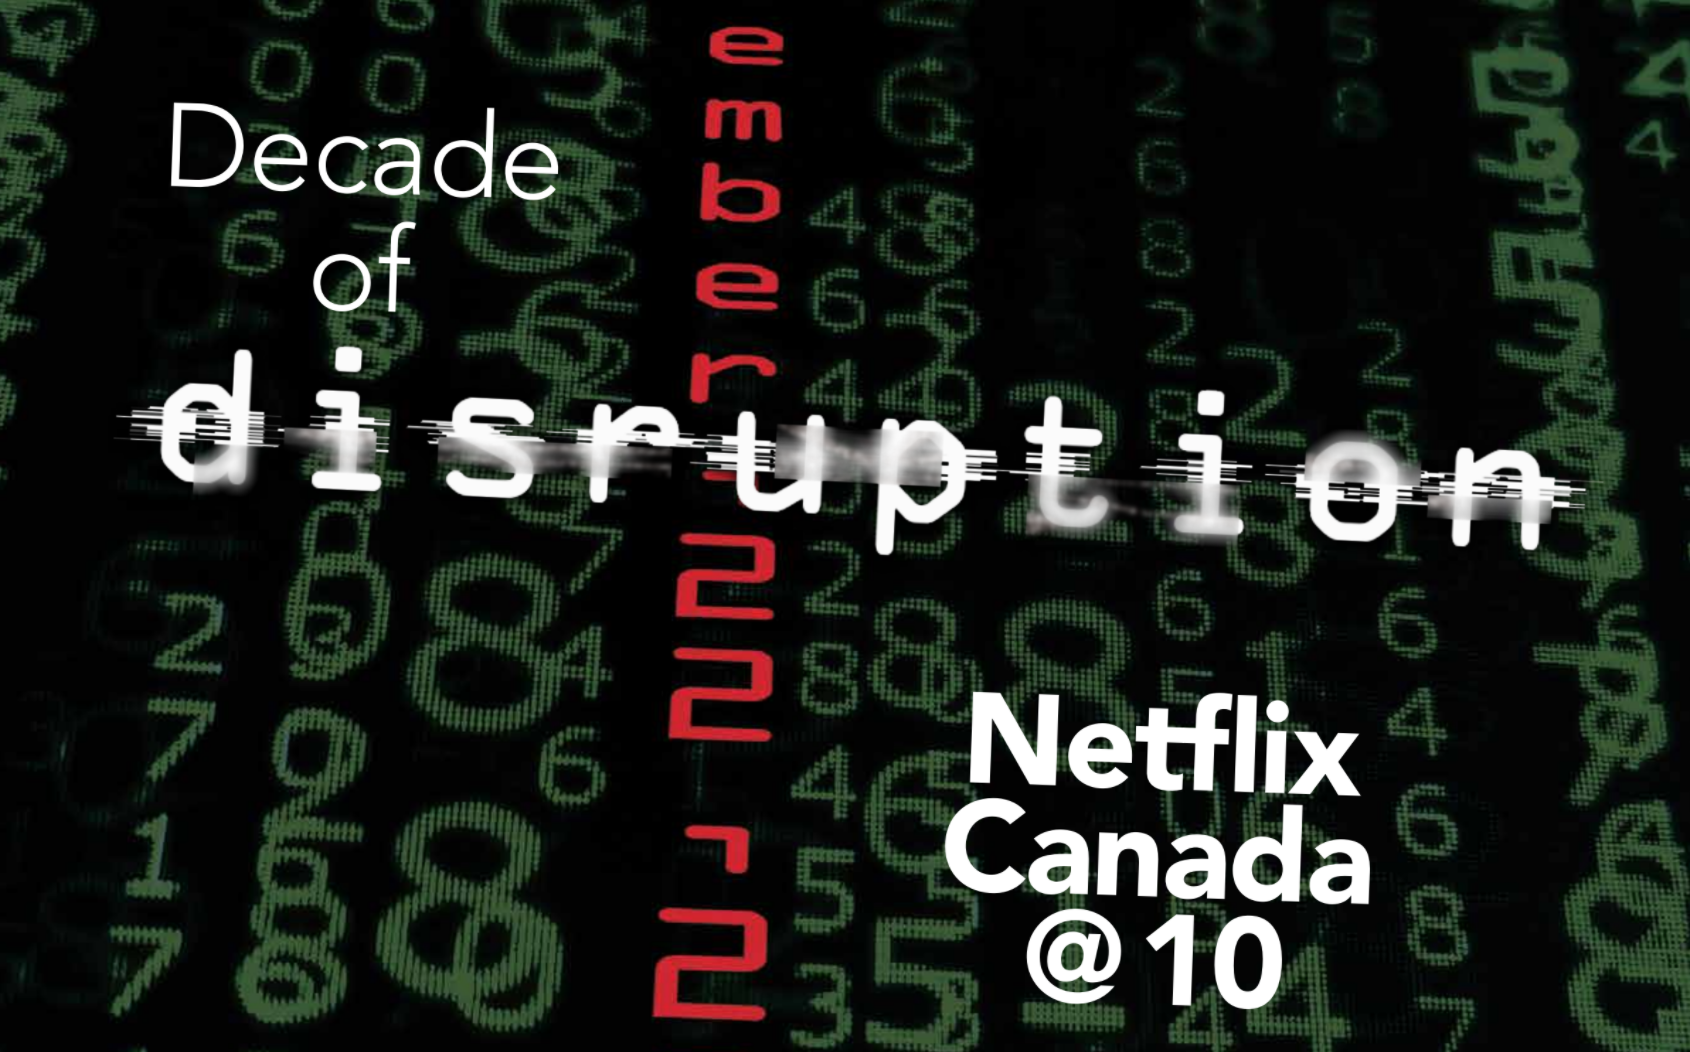 netflix @ 10 tribute graphic